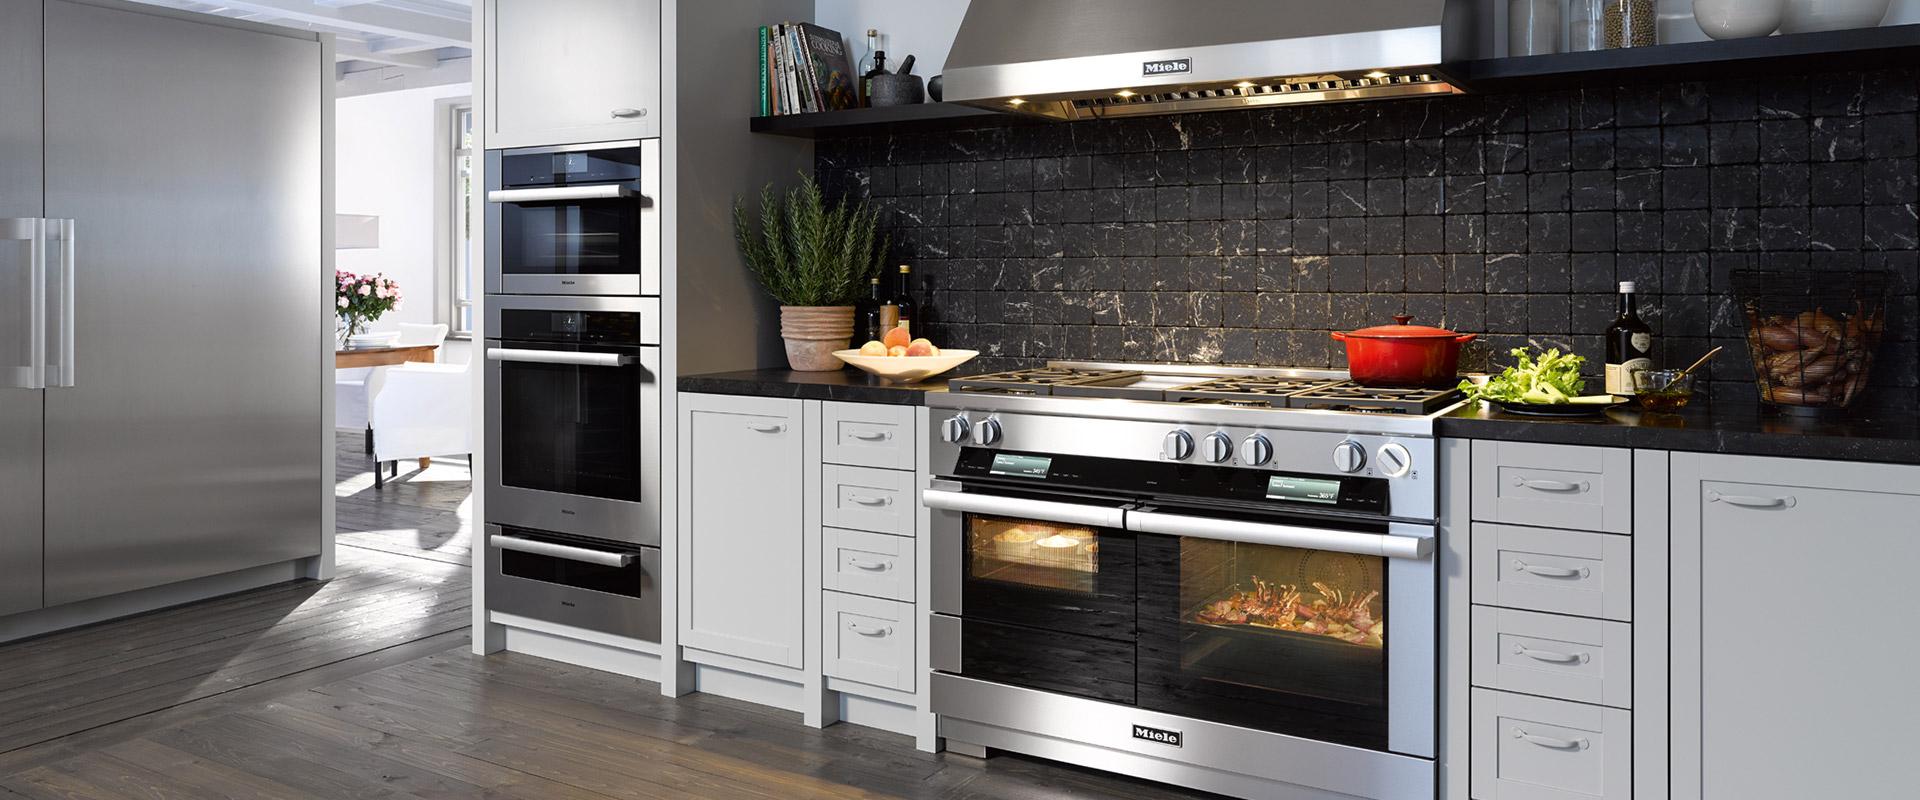 san-diego-best-appliance-repair